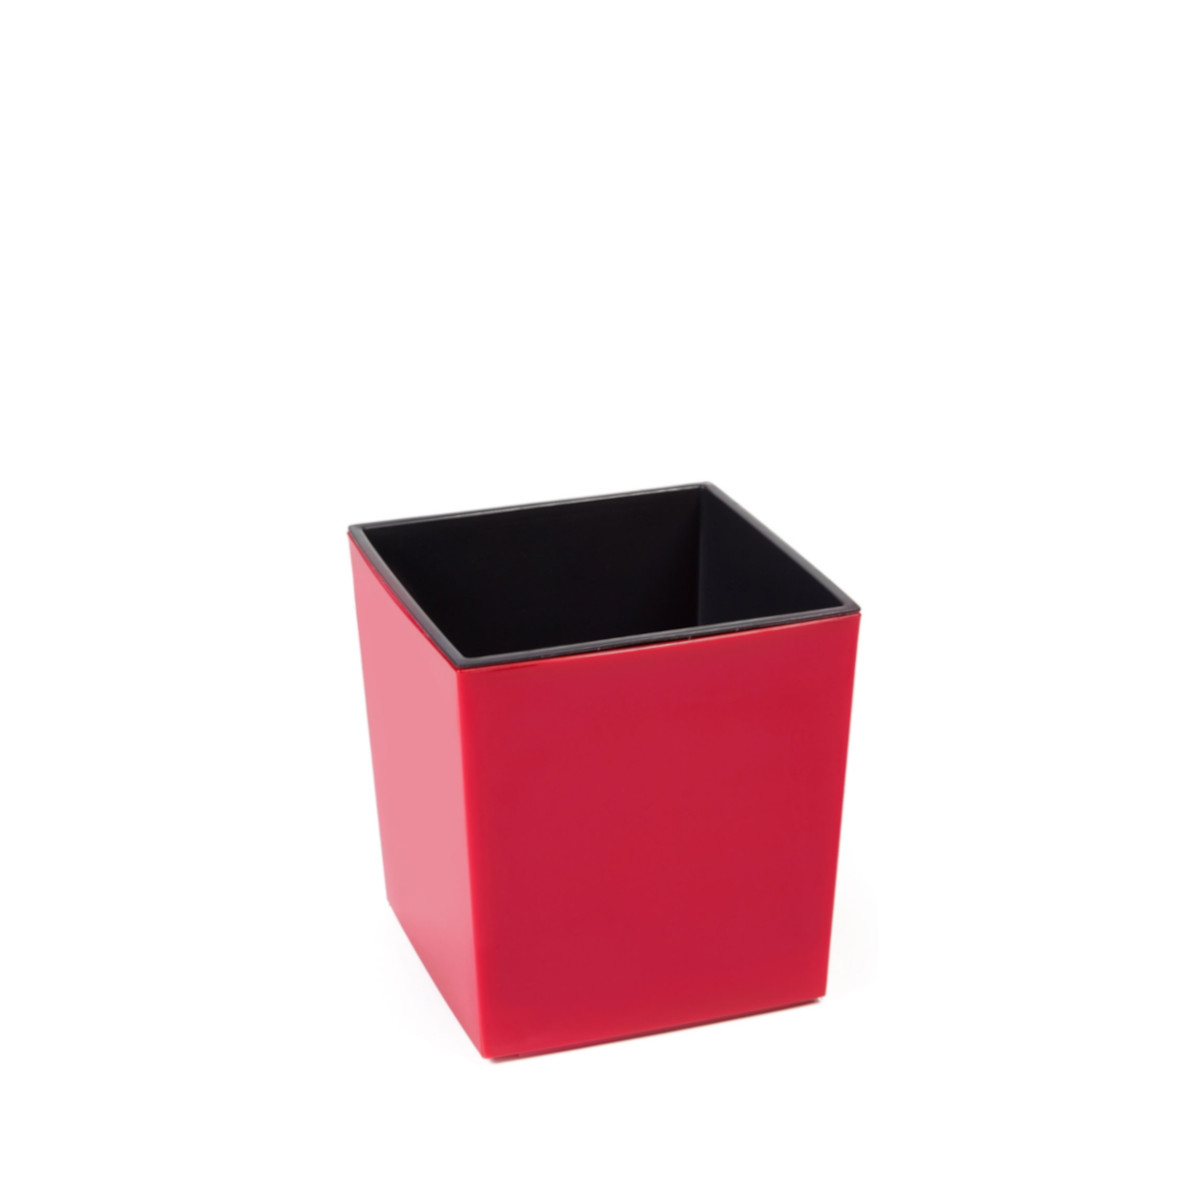 Lamela Donica JUKA 250×250 – czerwony